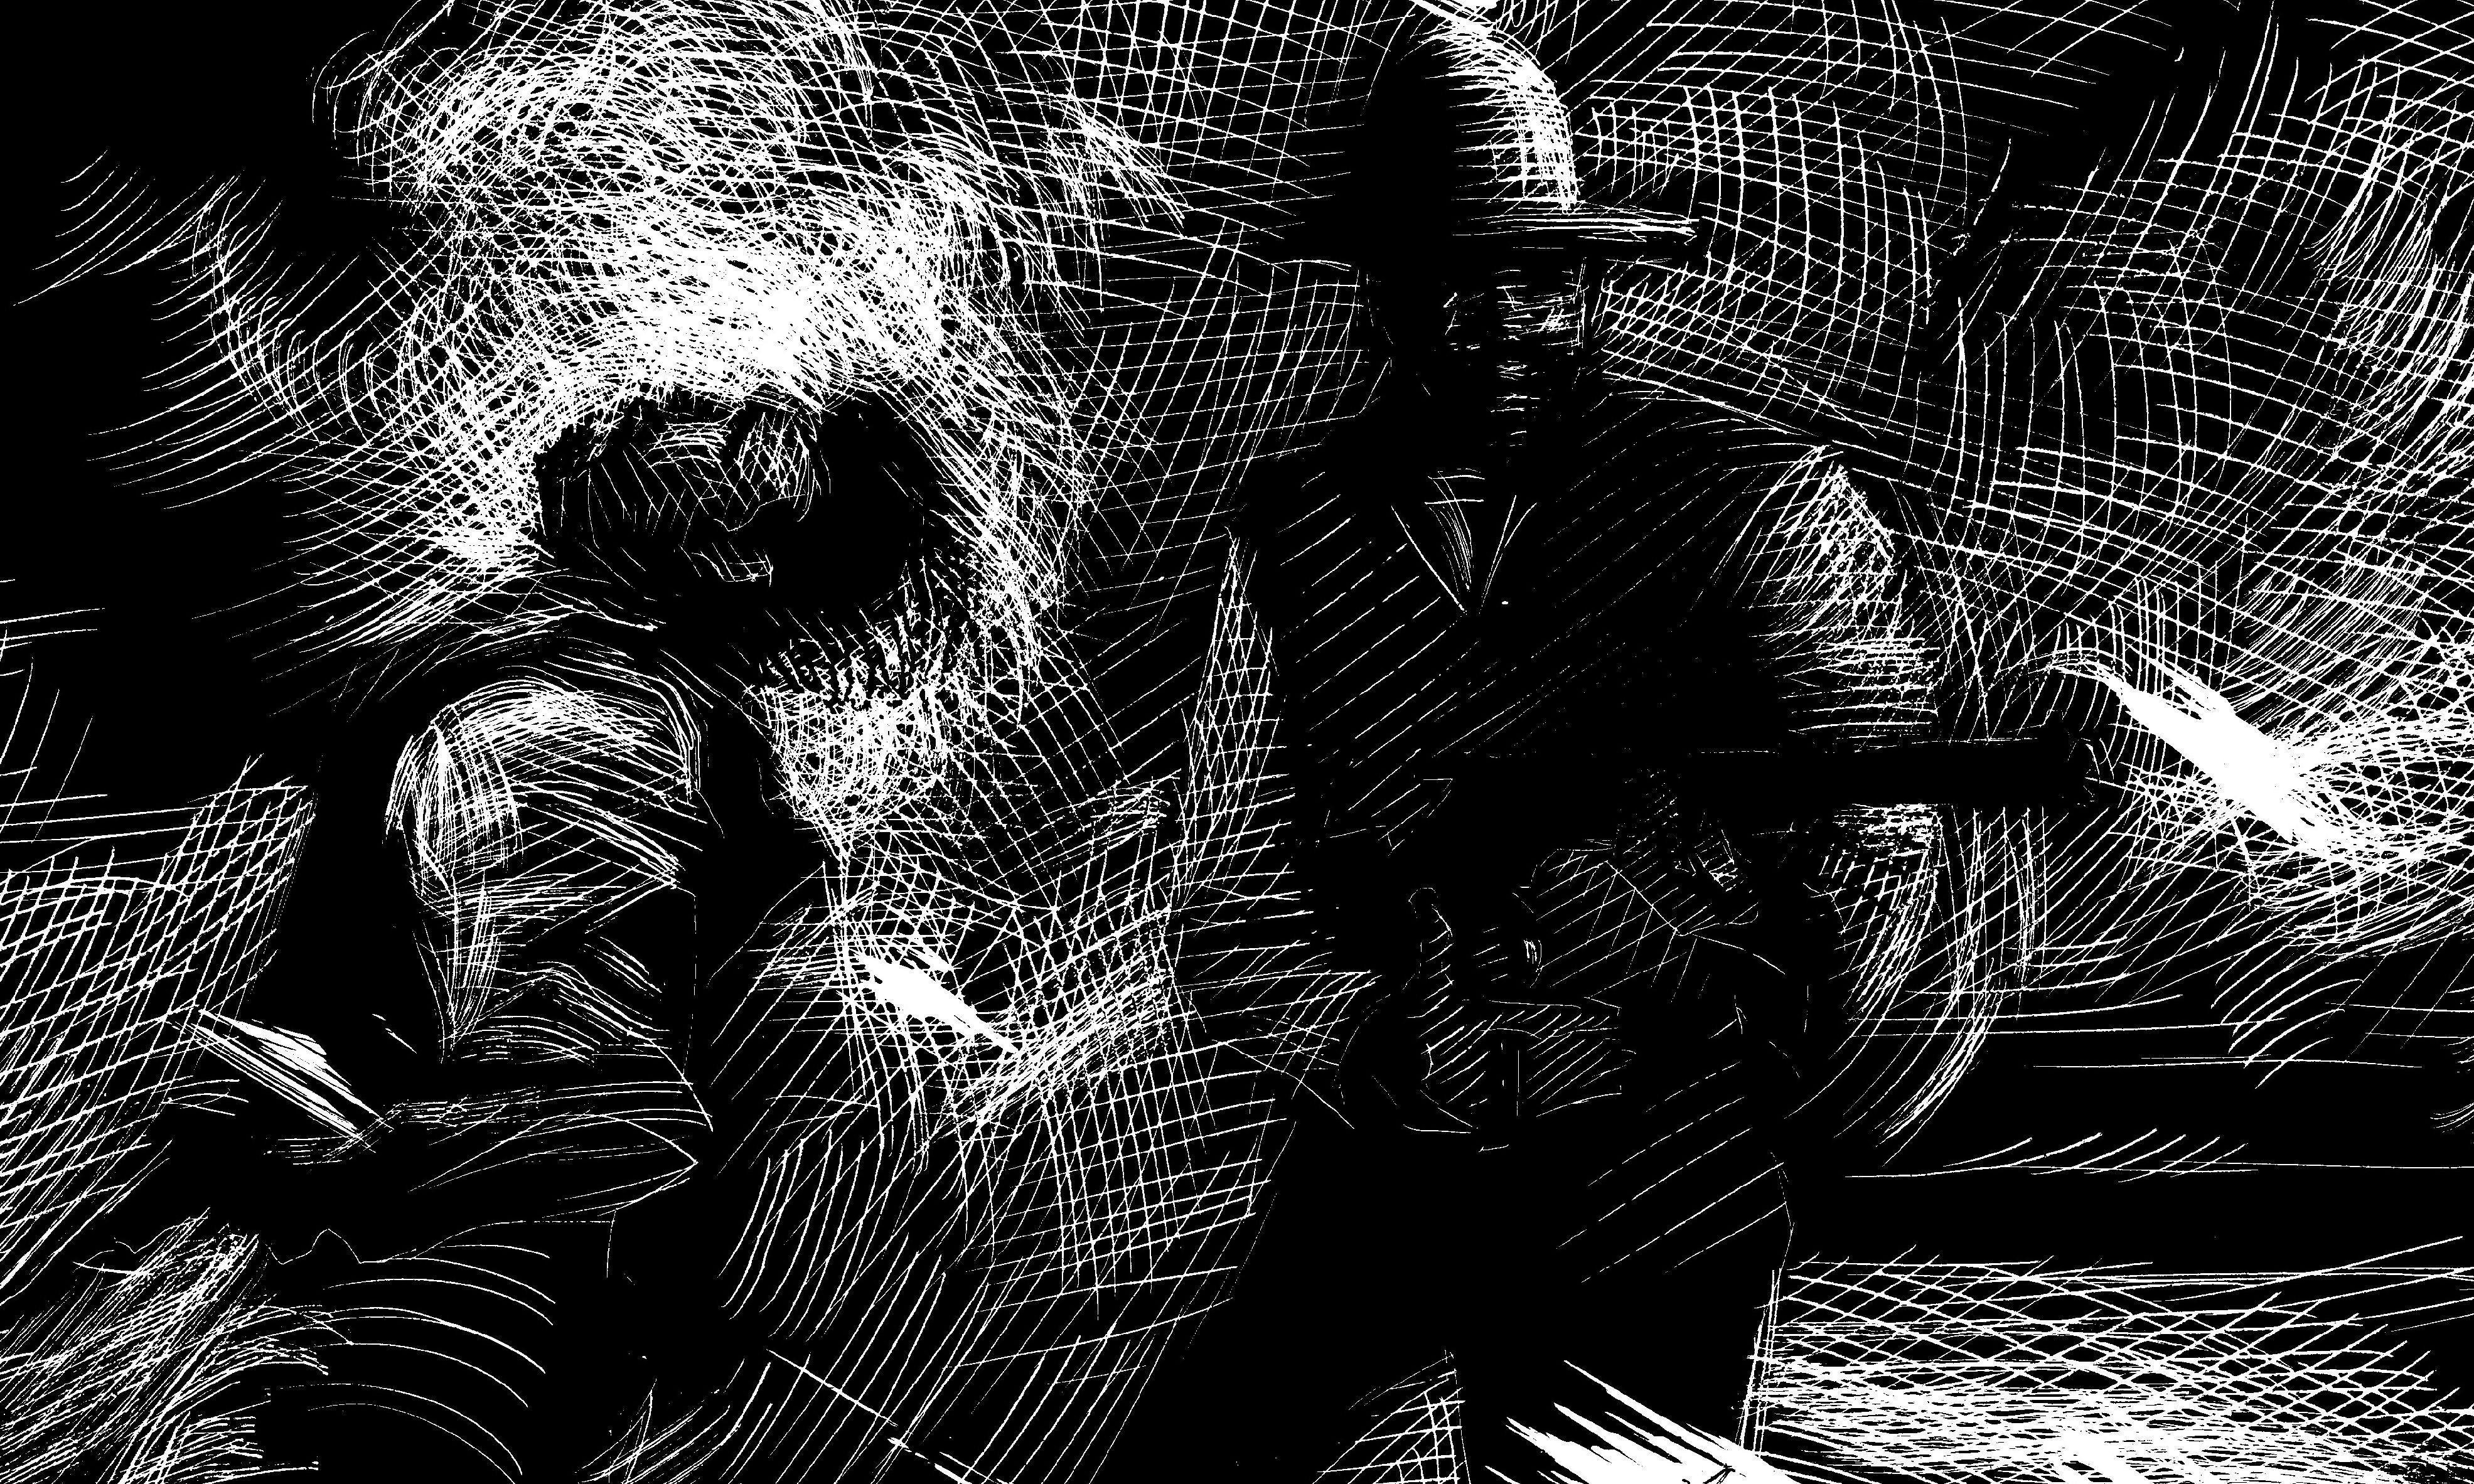 zip wyatt balck illustration by bob boze bell true west magazine